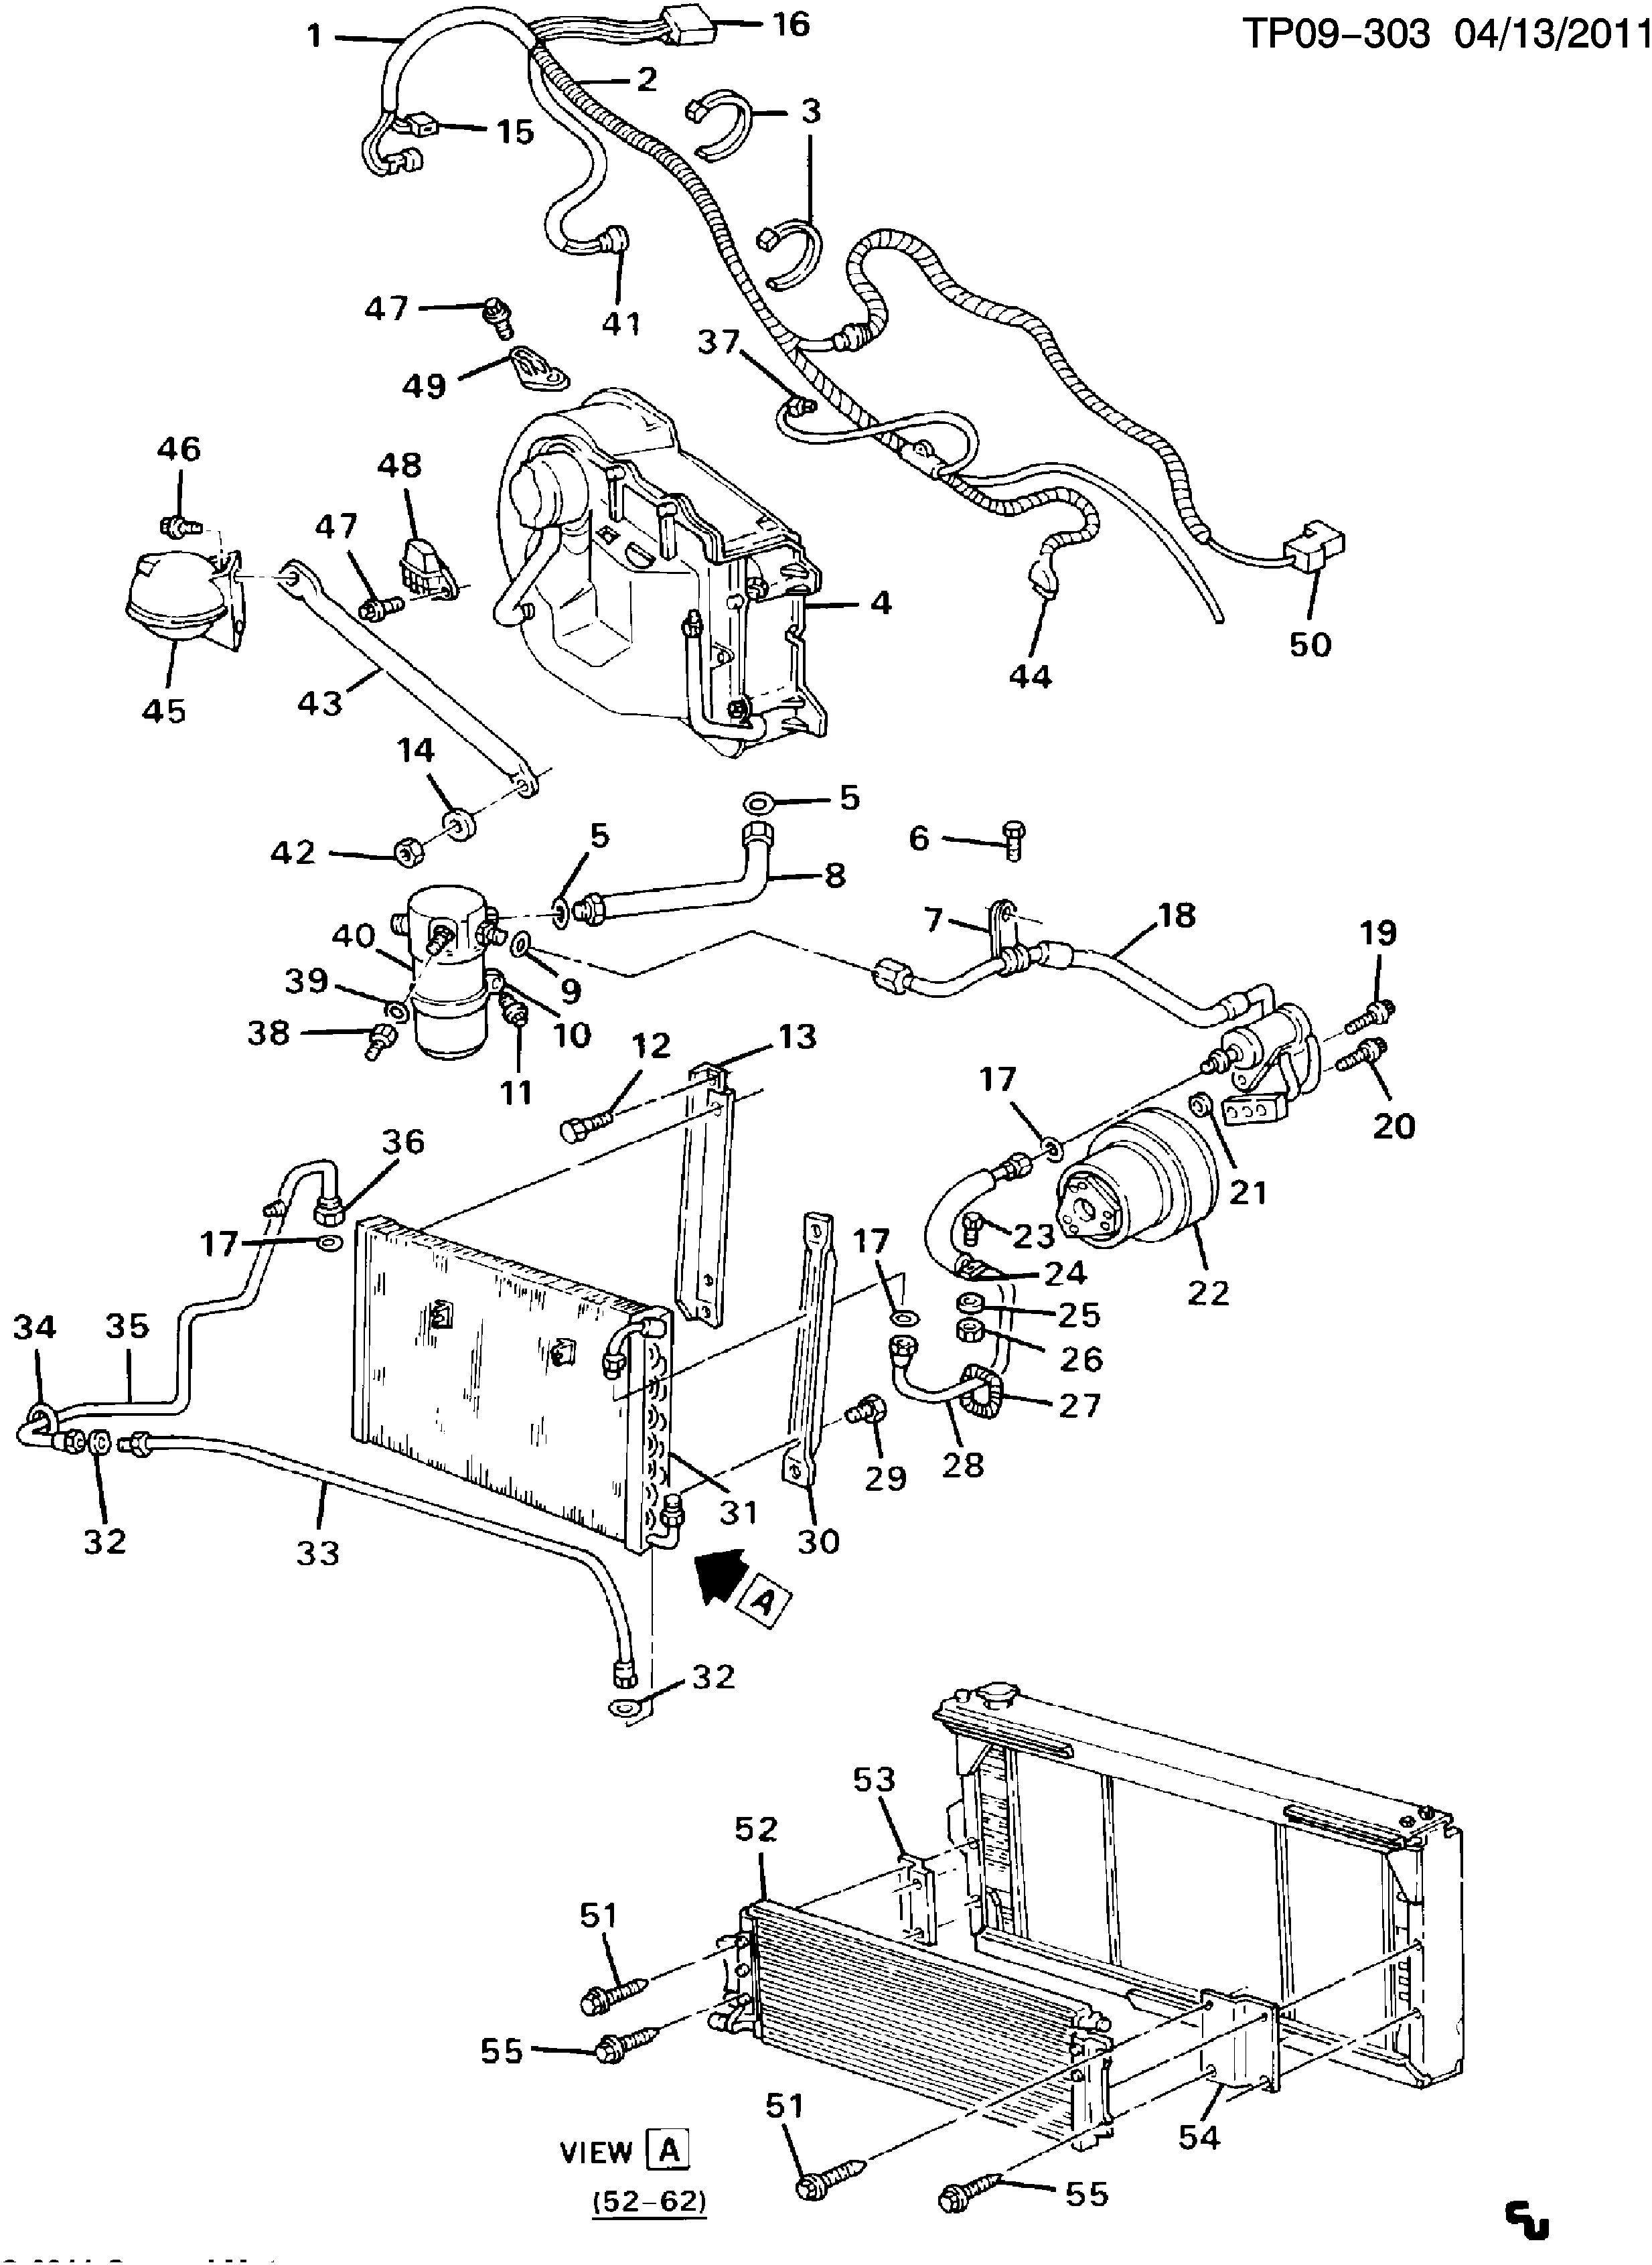 Chevrolet P30 A/C REFRIGERATION SYSTEM